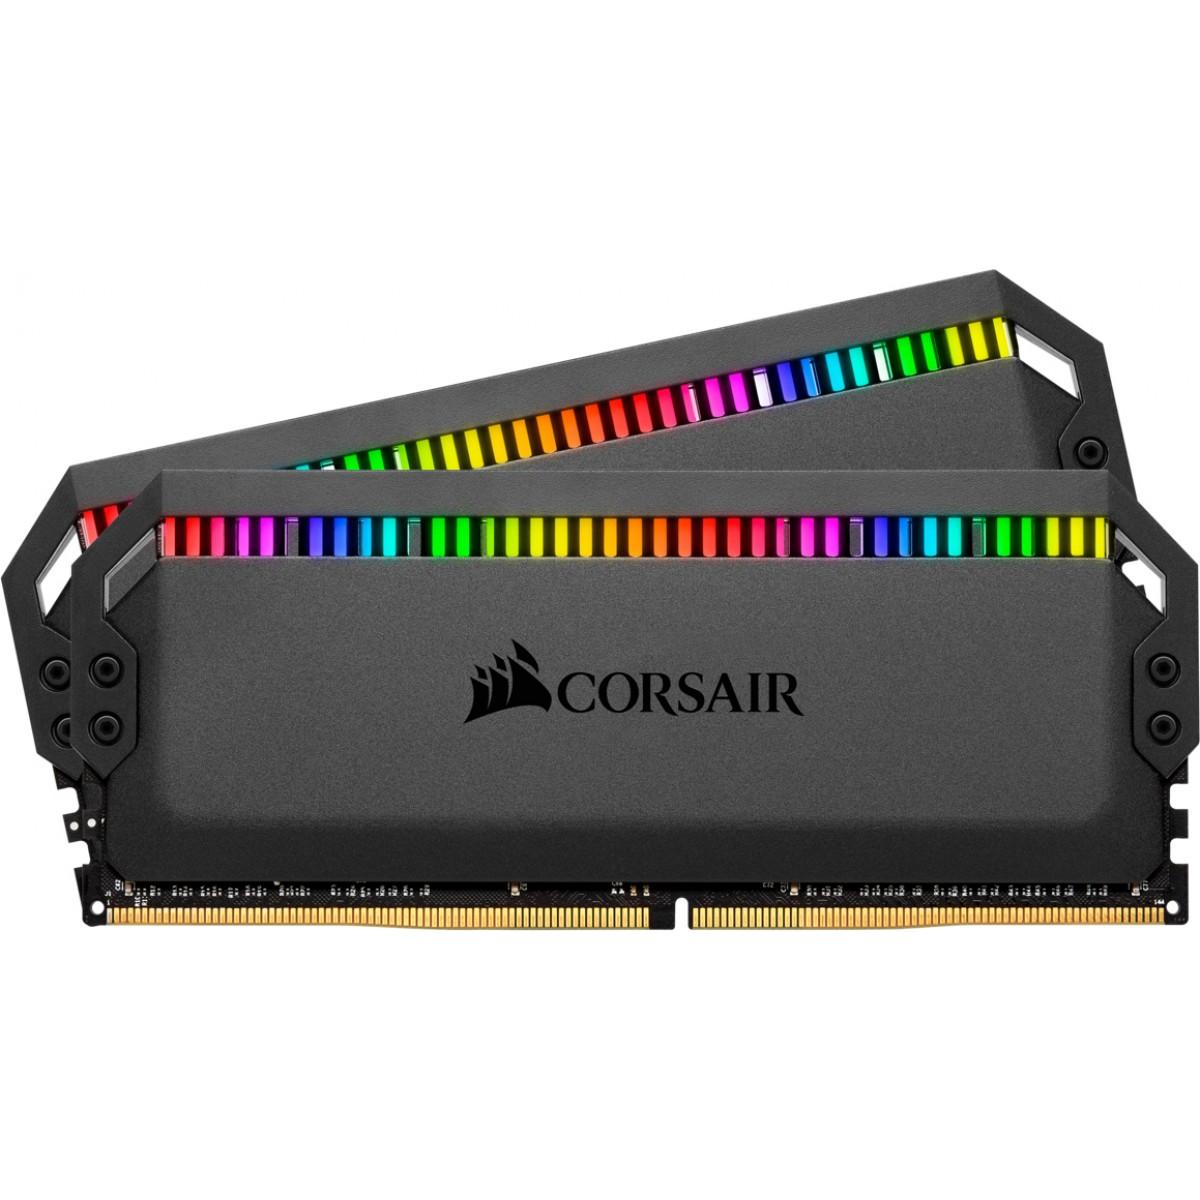 Memória DDR4 Corsair Dominator Platinum RGB, 16GB (2x8GB), 3600MHz, CMT16GX4M2C3600C18